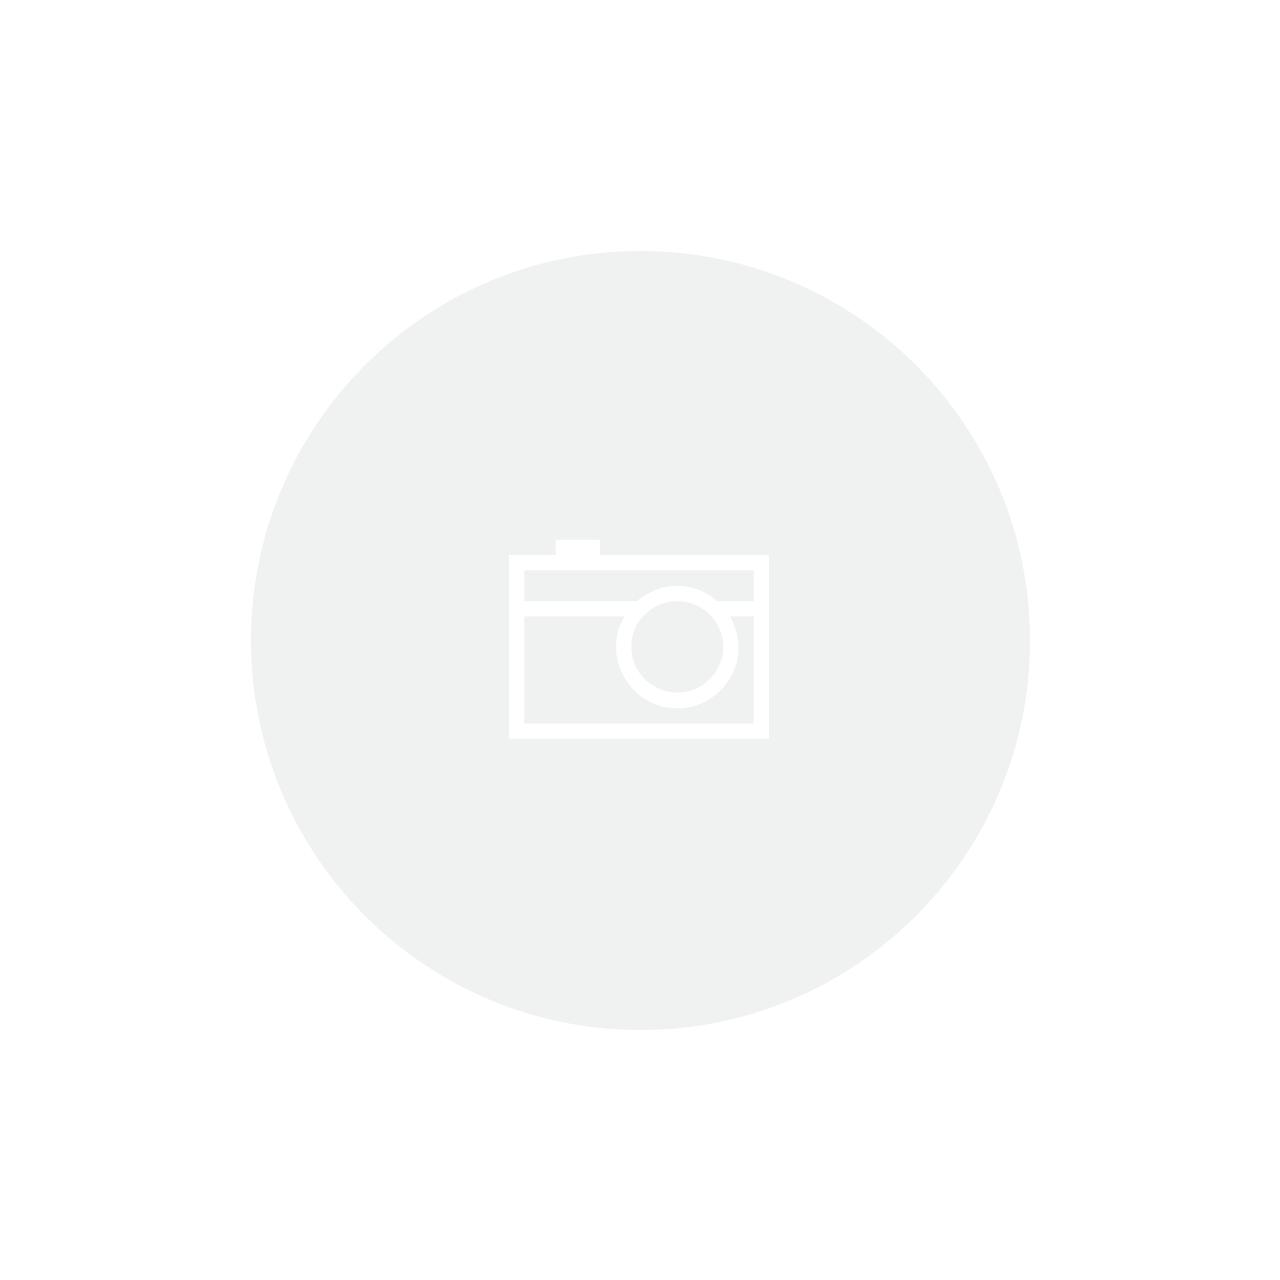 Papel Artesanal Indiano - Ref. 48